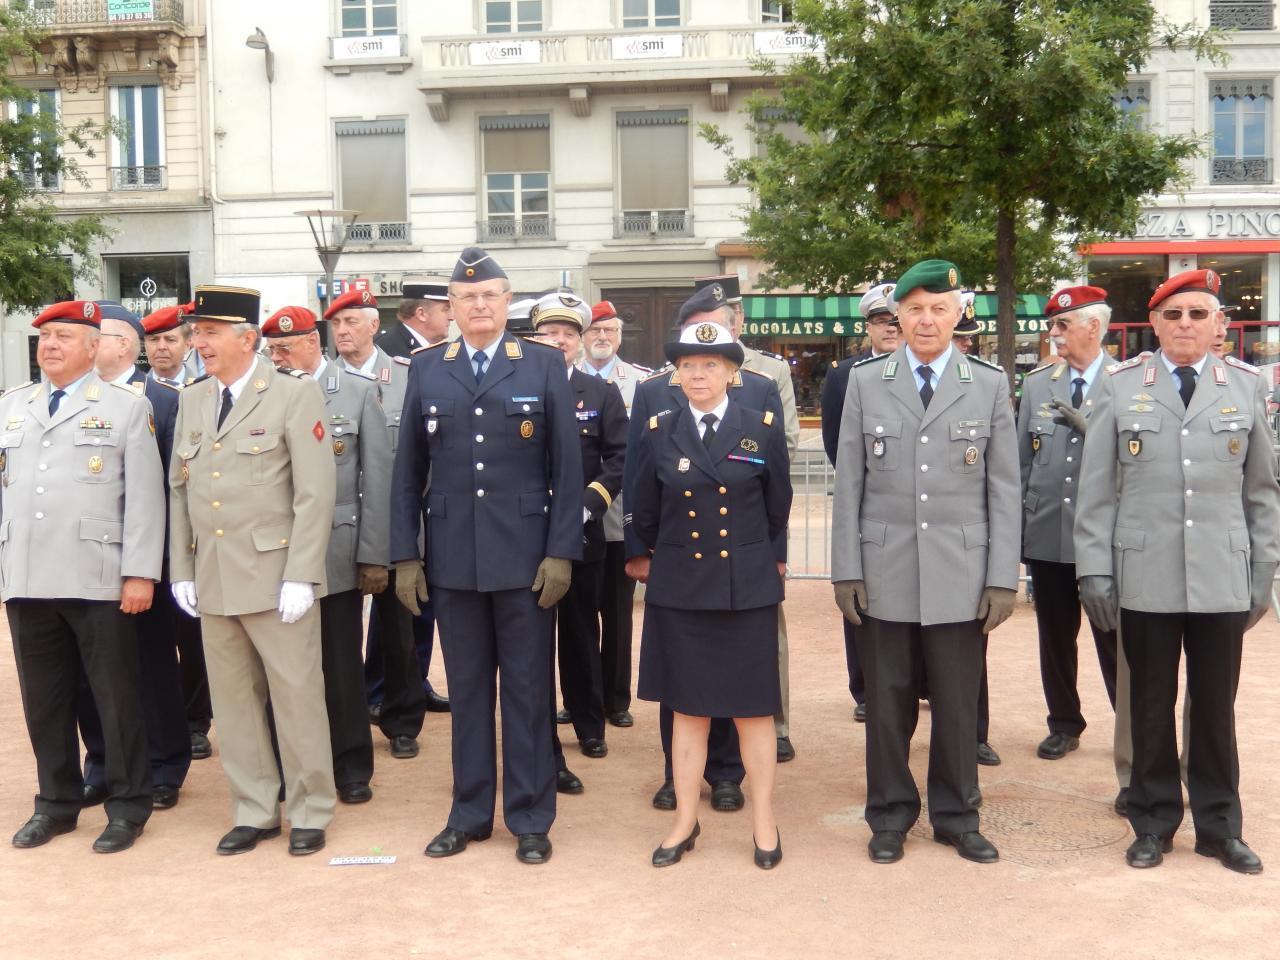 Cérémonie du 8 mai 2015 place Bellecour